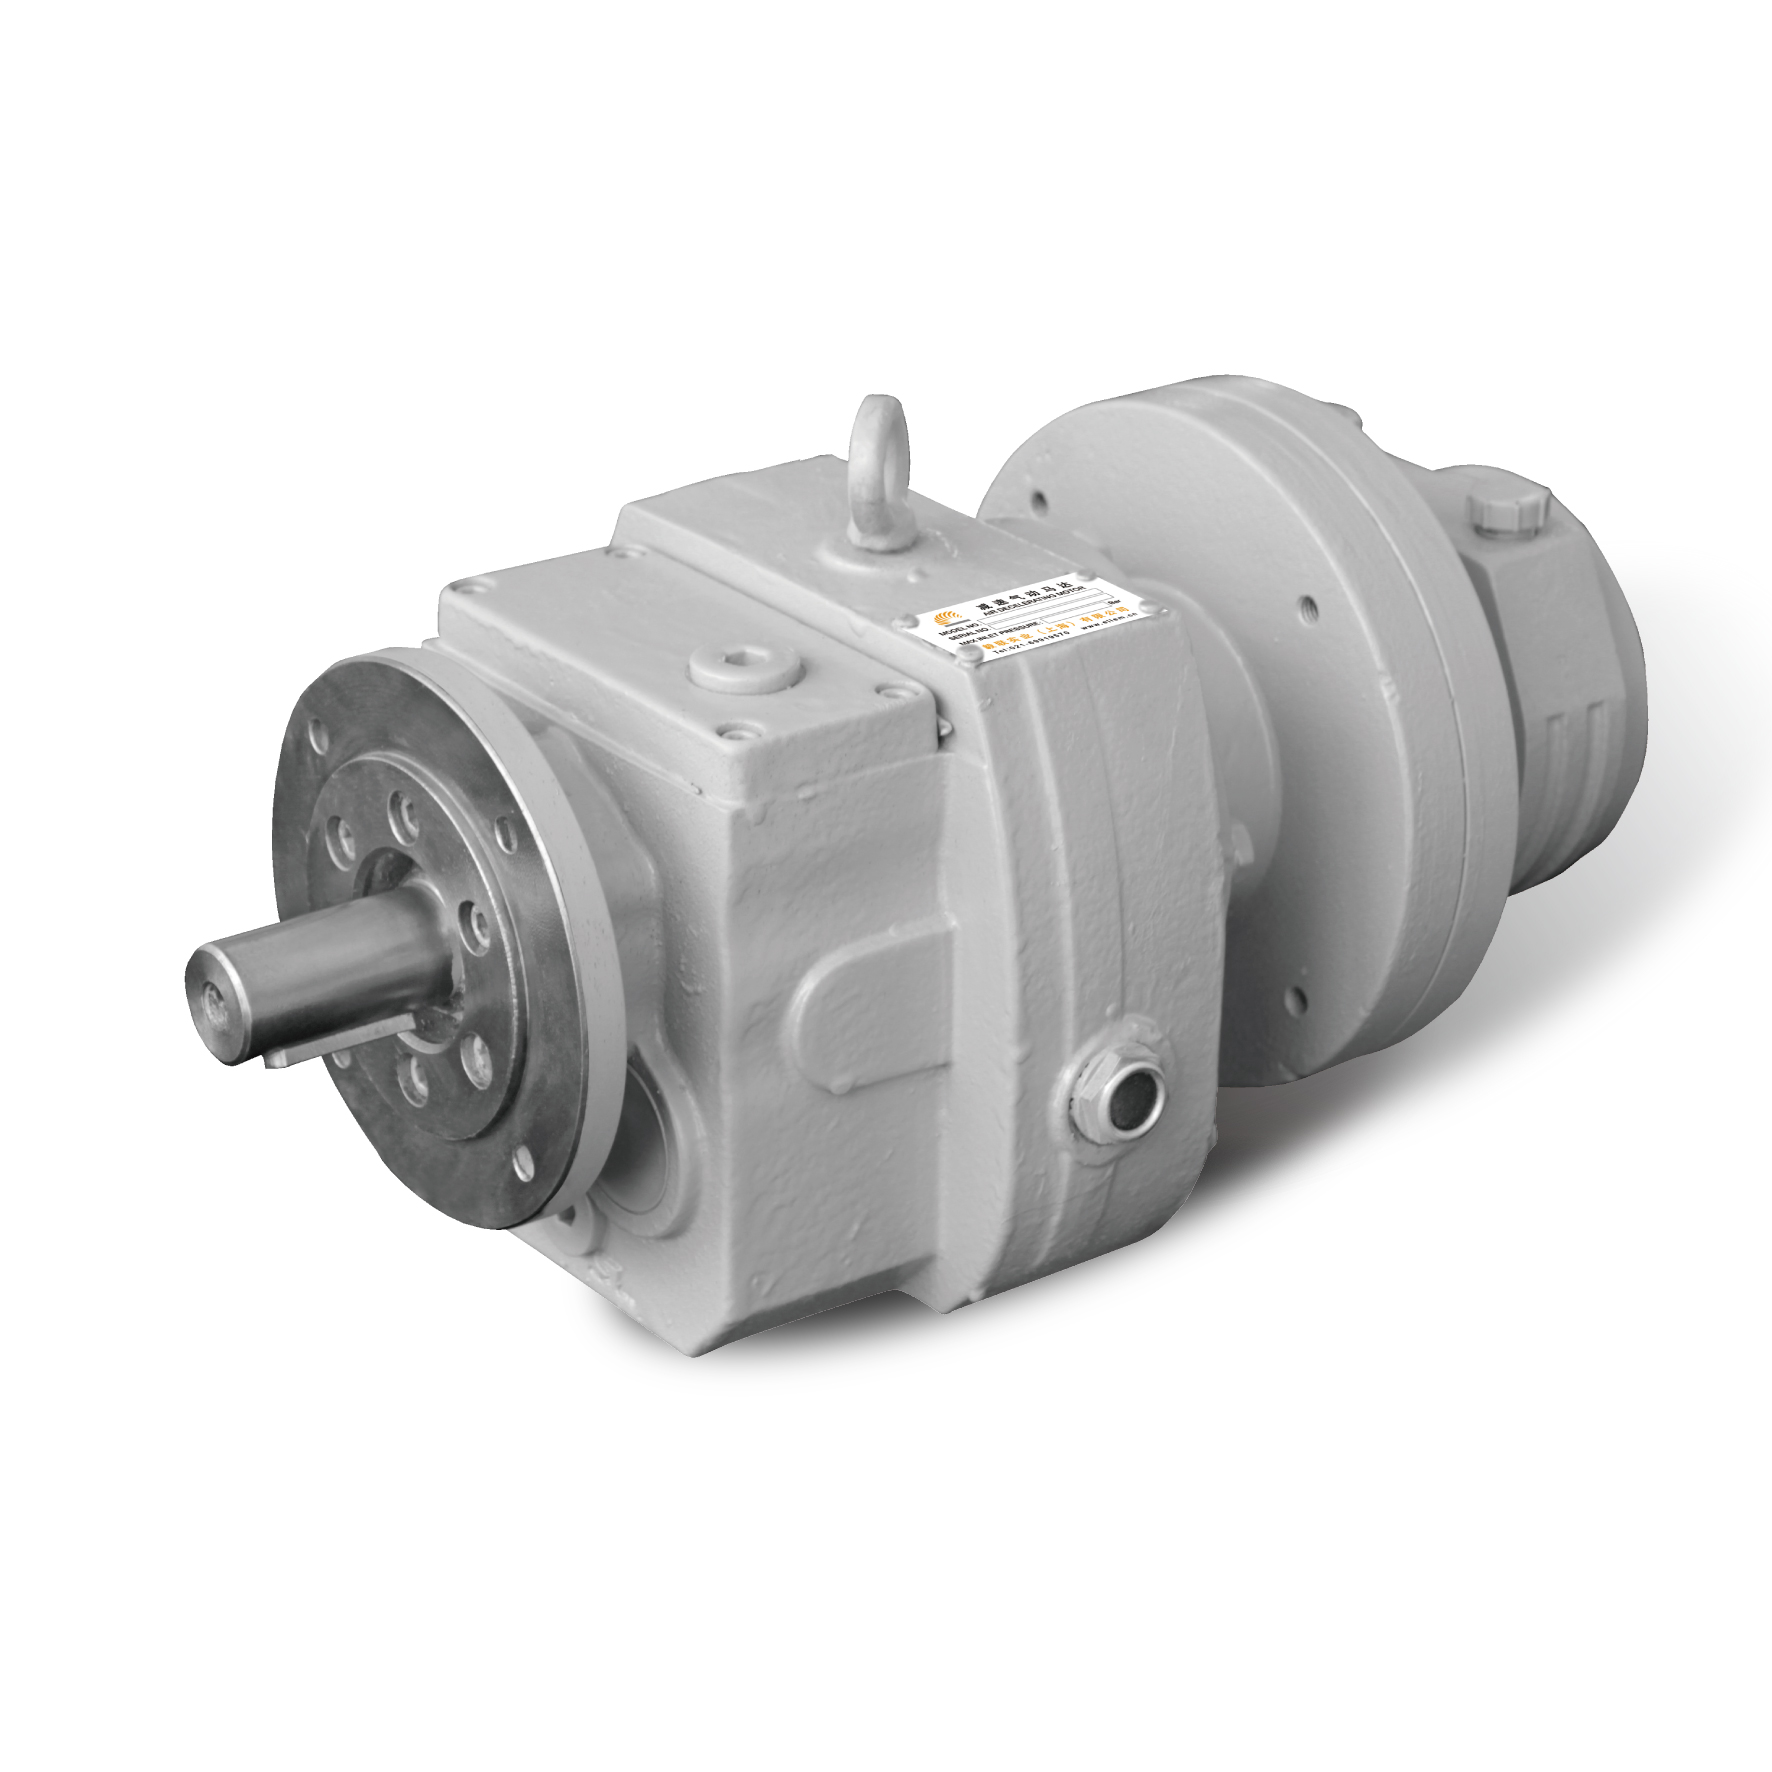 M-B Series Helical Gear Motor